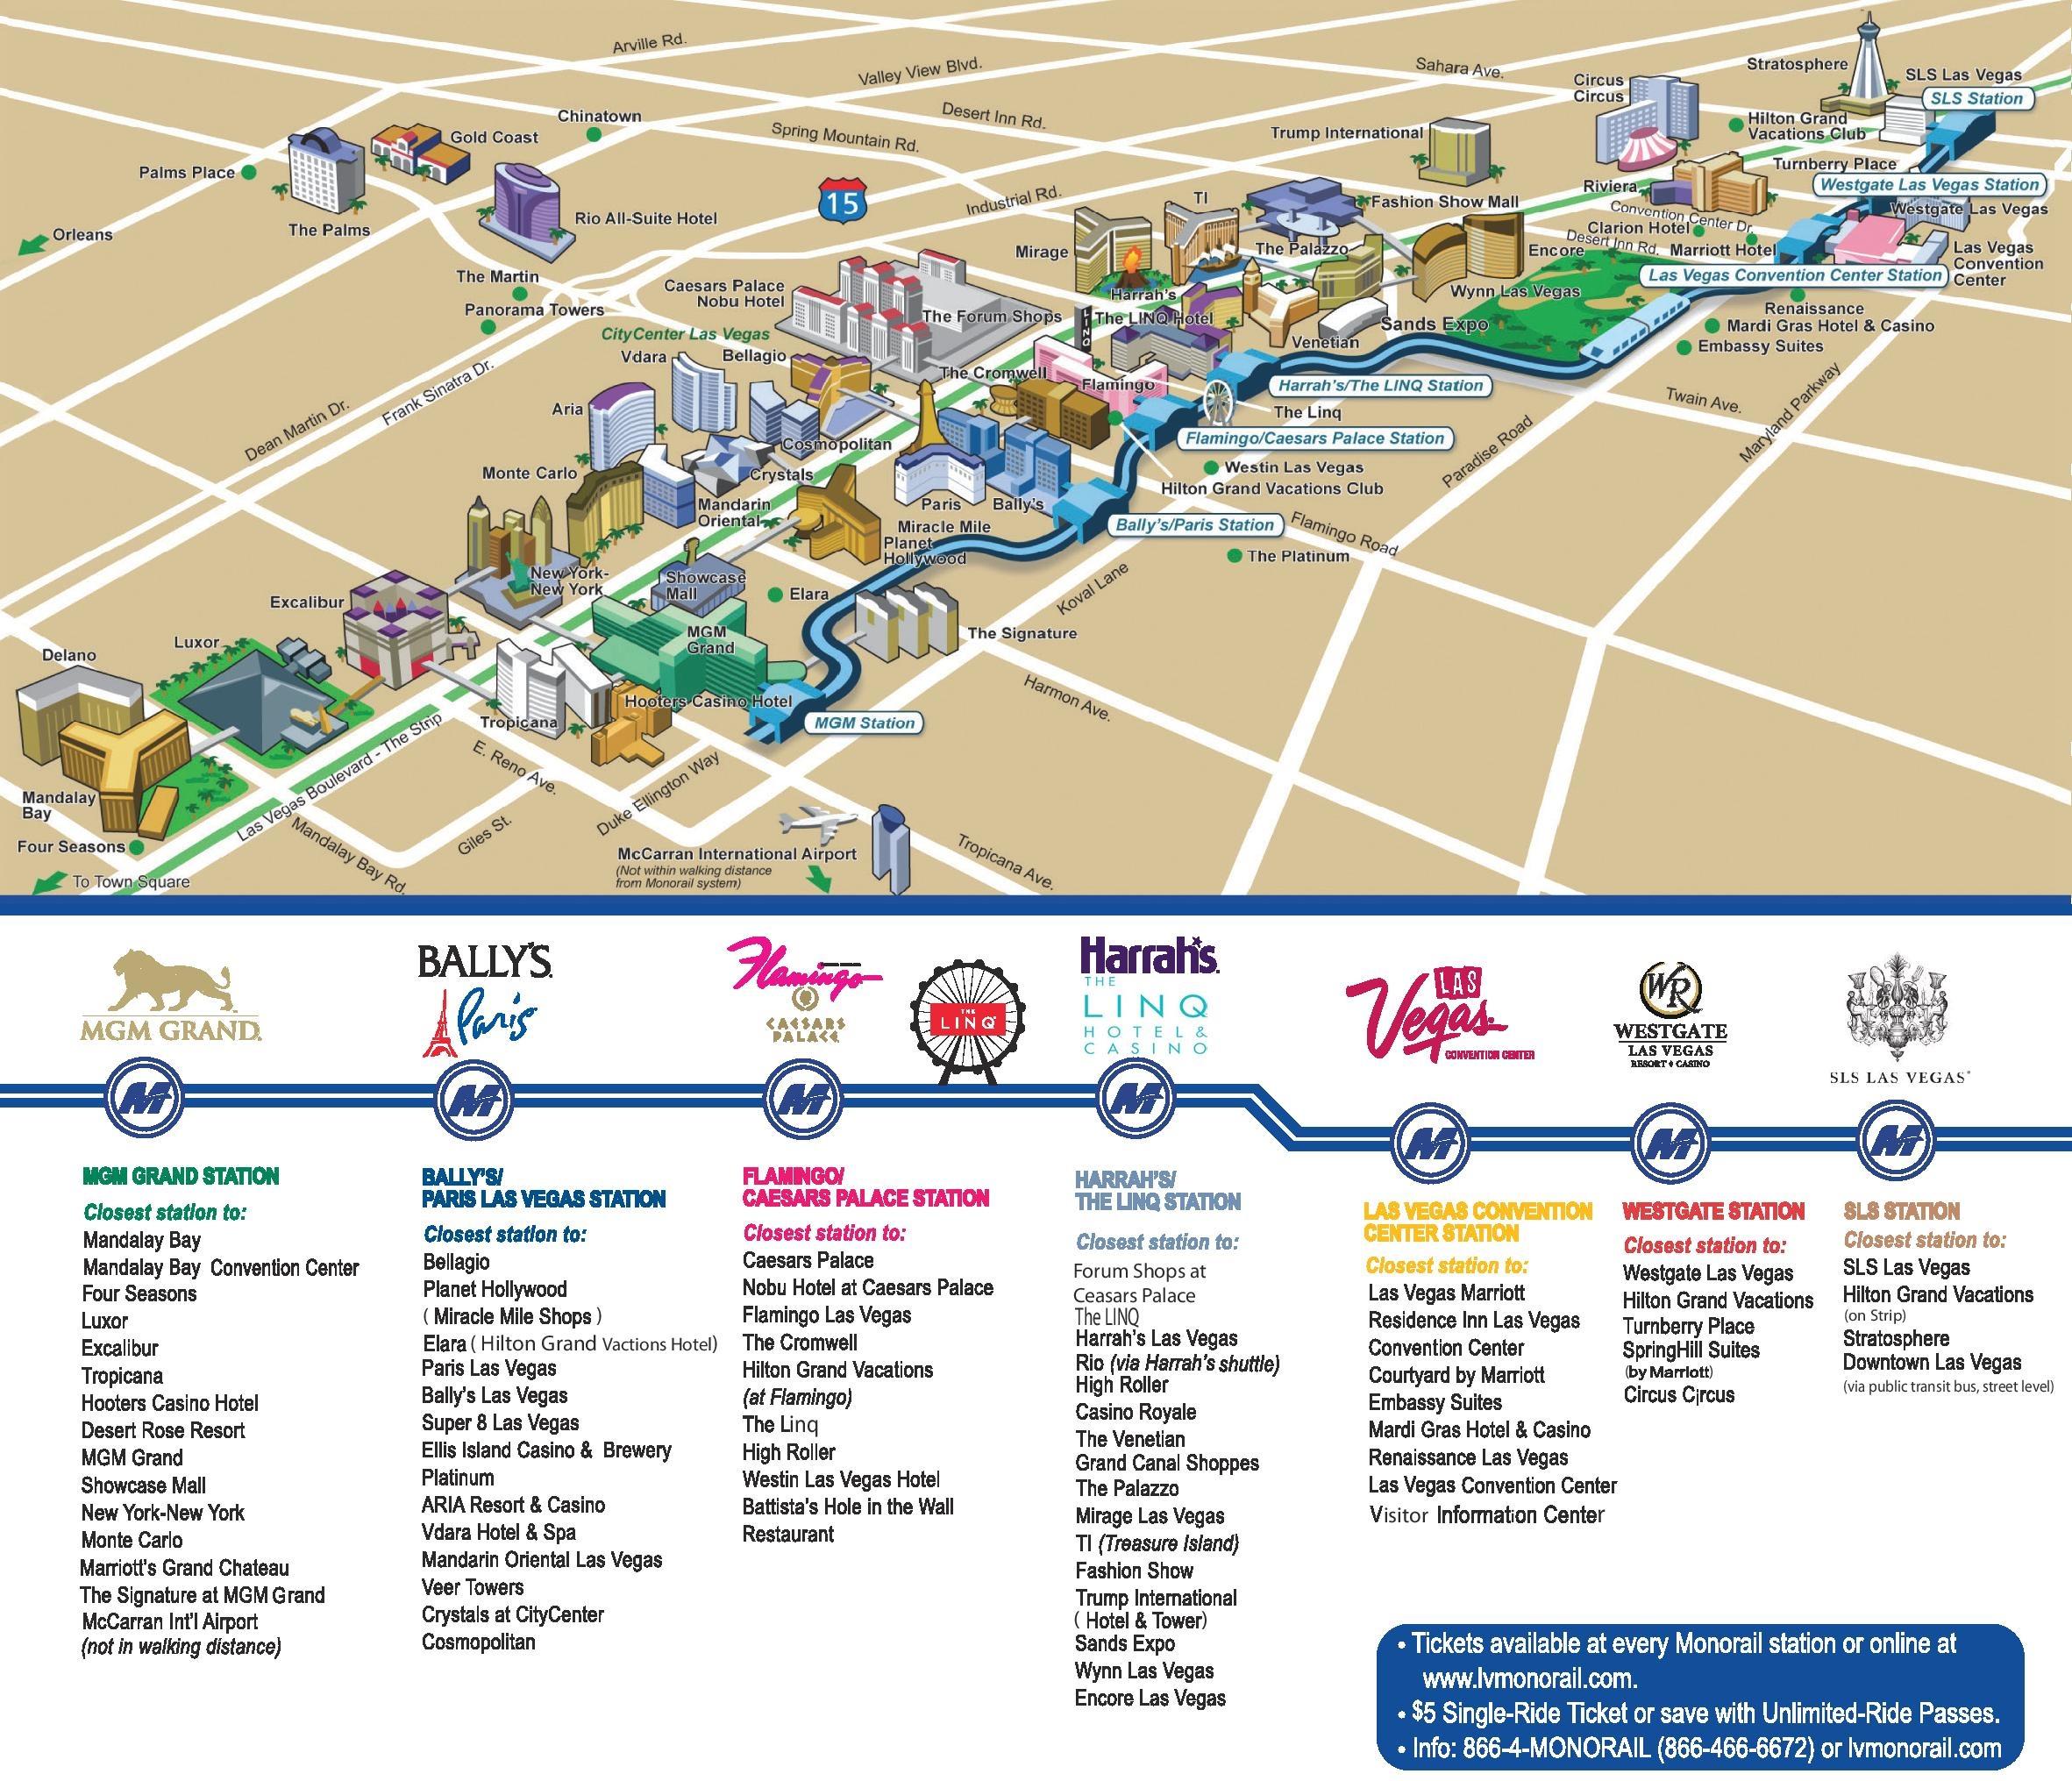 Las Vegas Strip Hotels Map And Travel Information | Download Free - Free Printable Map Of The Las Vegas Strip